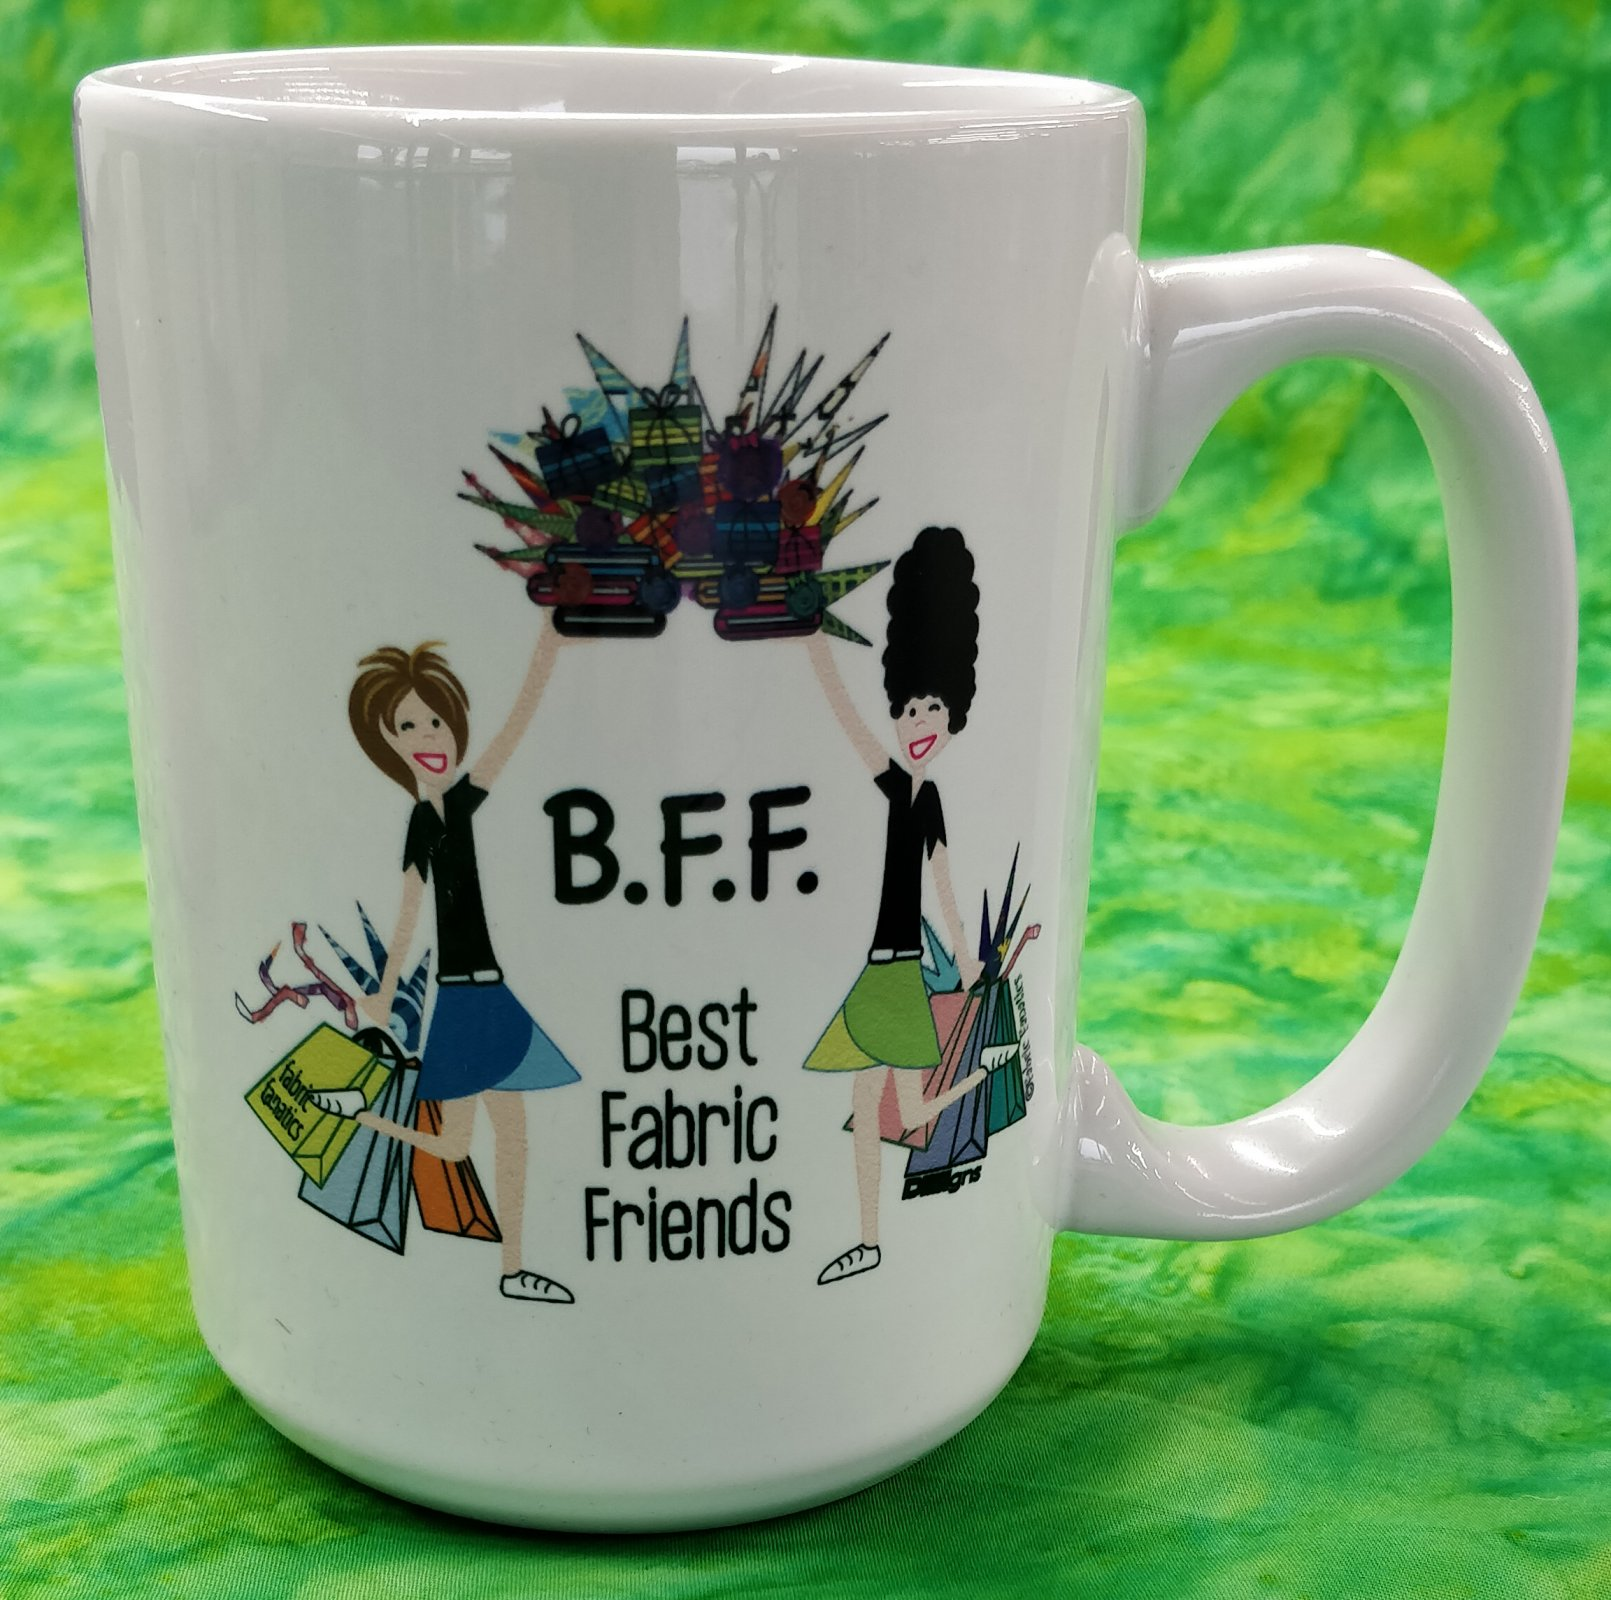 Mug - BFF Best Fabric Friend - in store or curbside